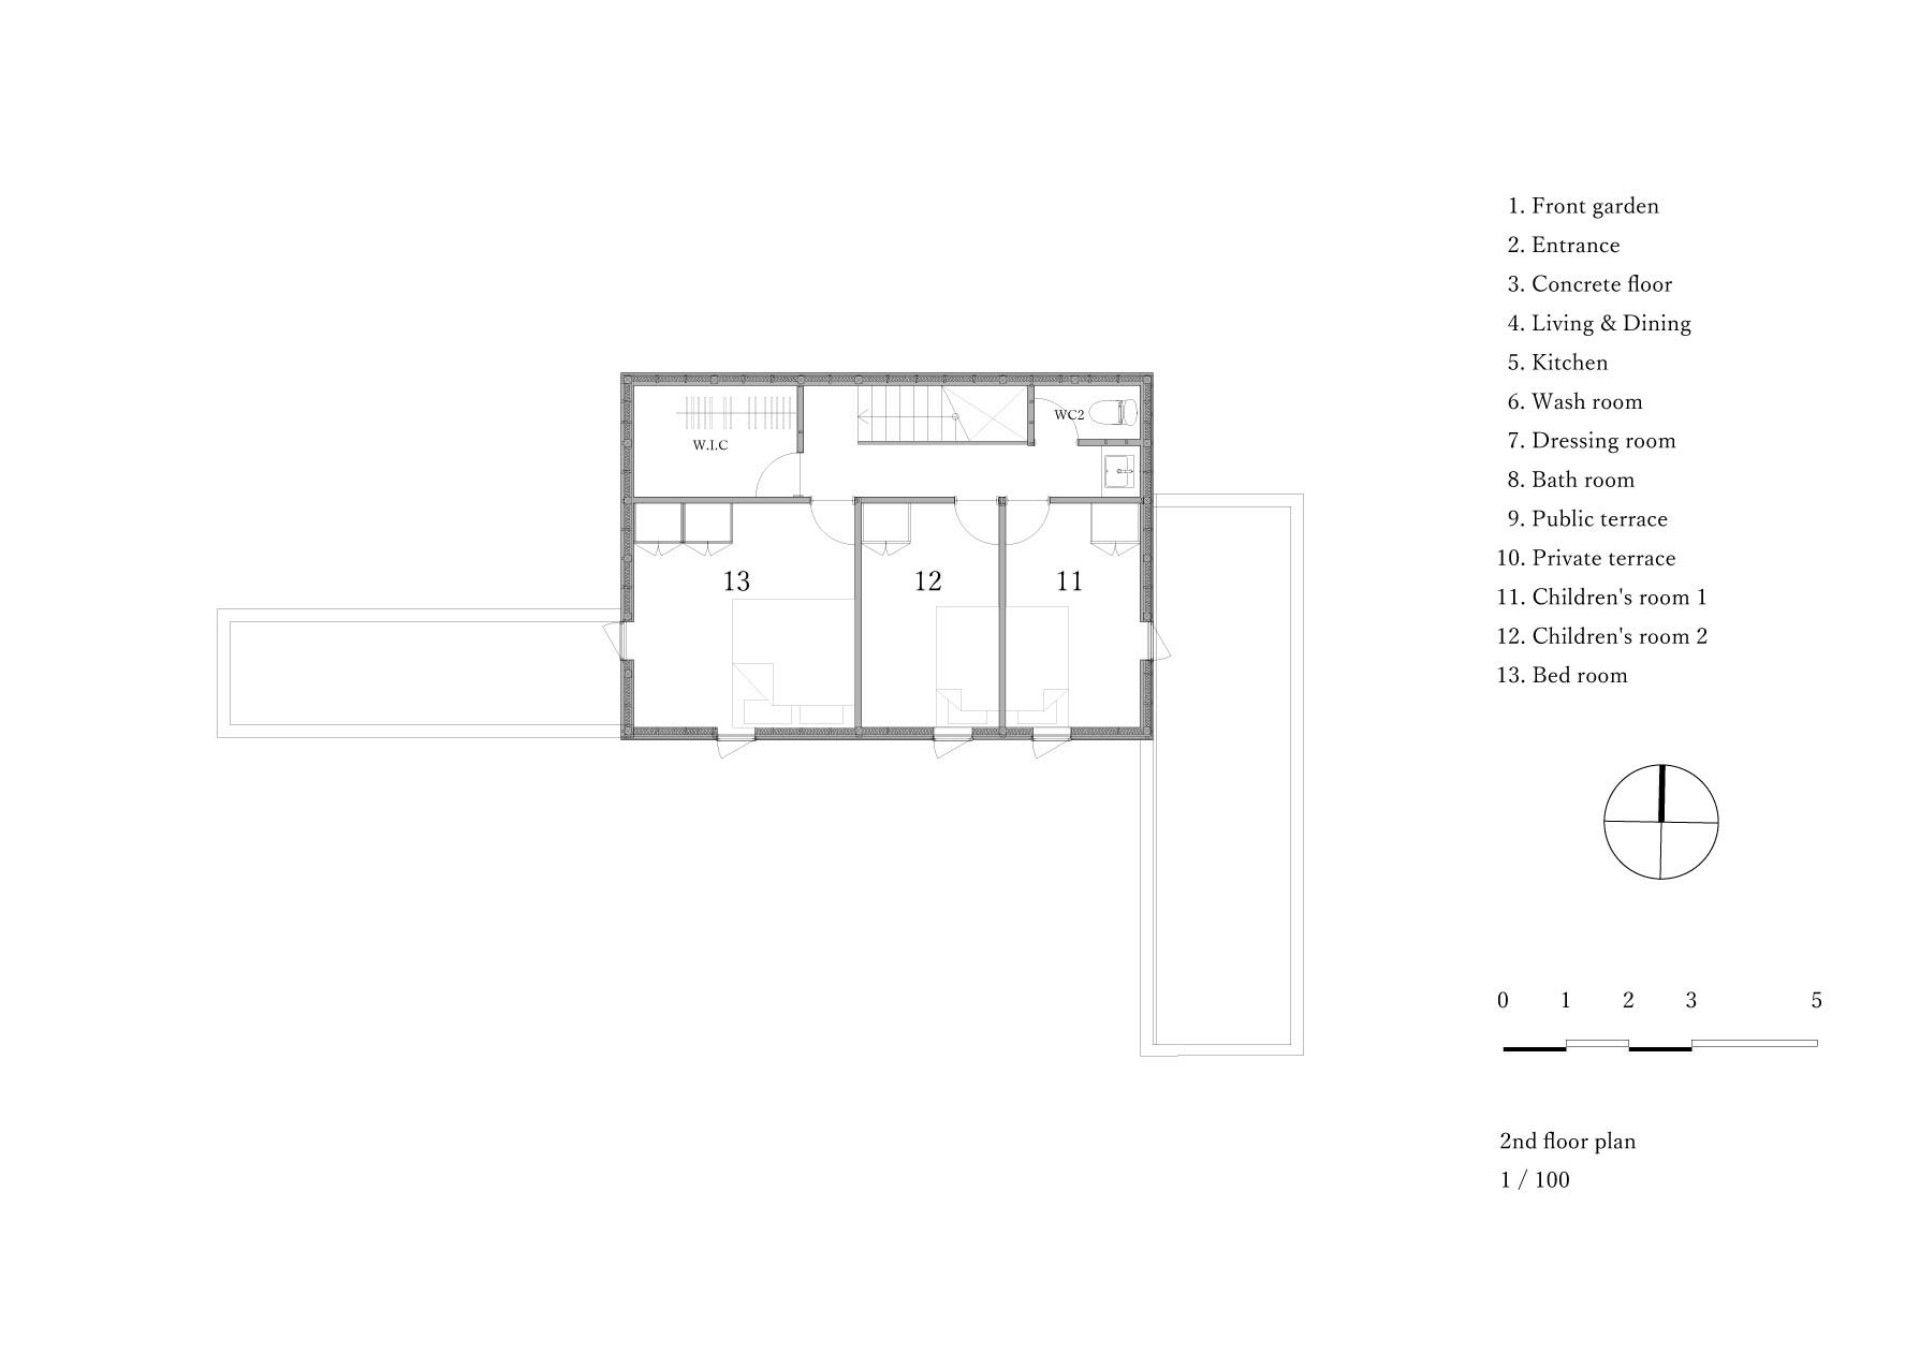 Yamazaki Kentaro Design Workshop Creates The Hayama House Terrace In The Town Floornature In 2020 Architect House Terrace Design